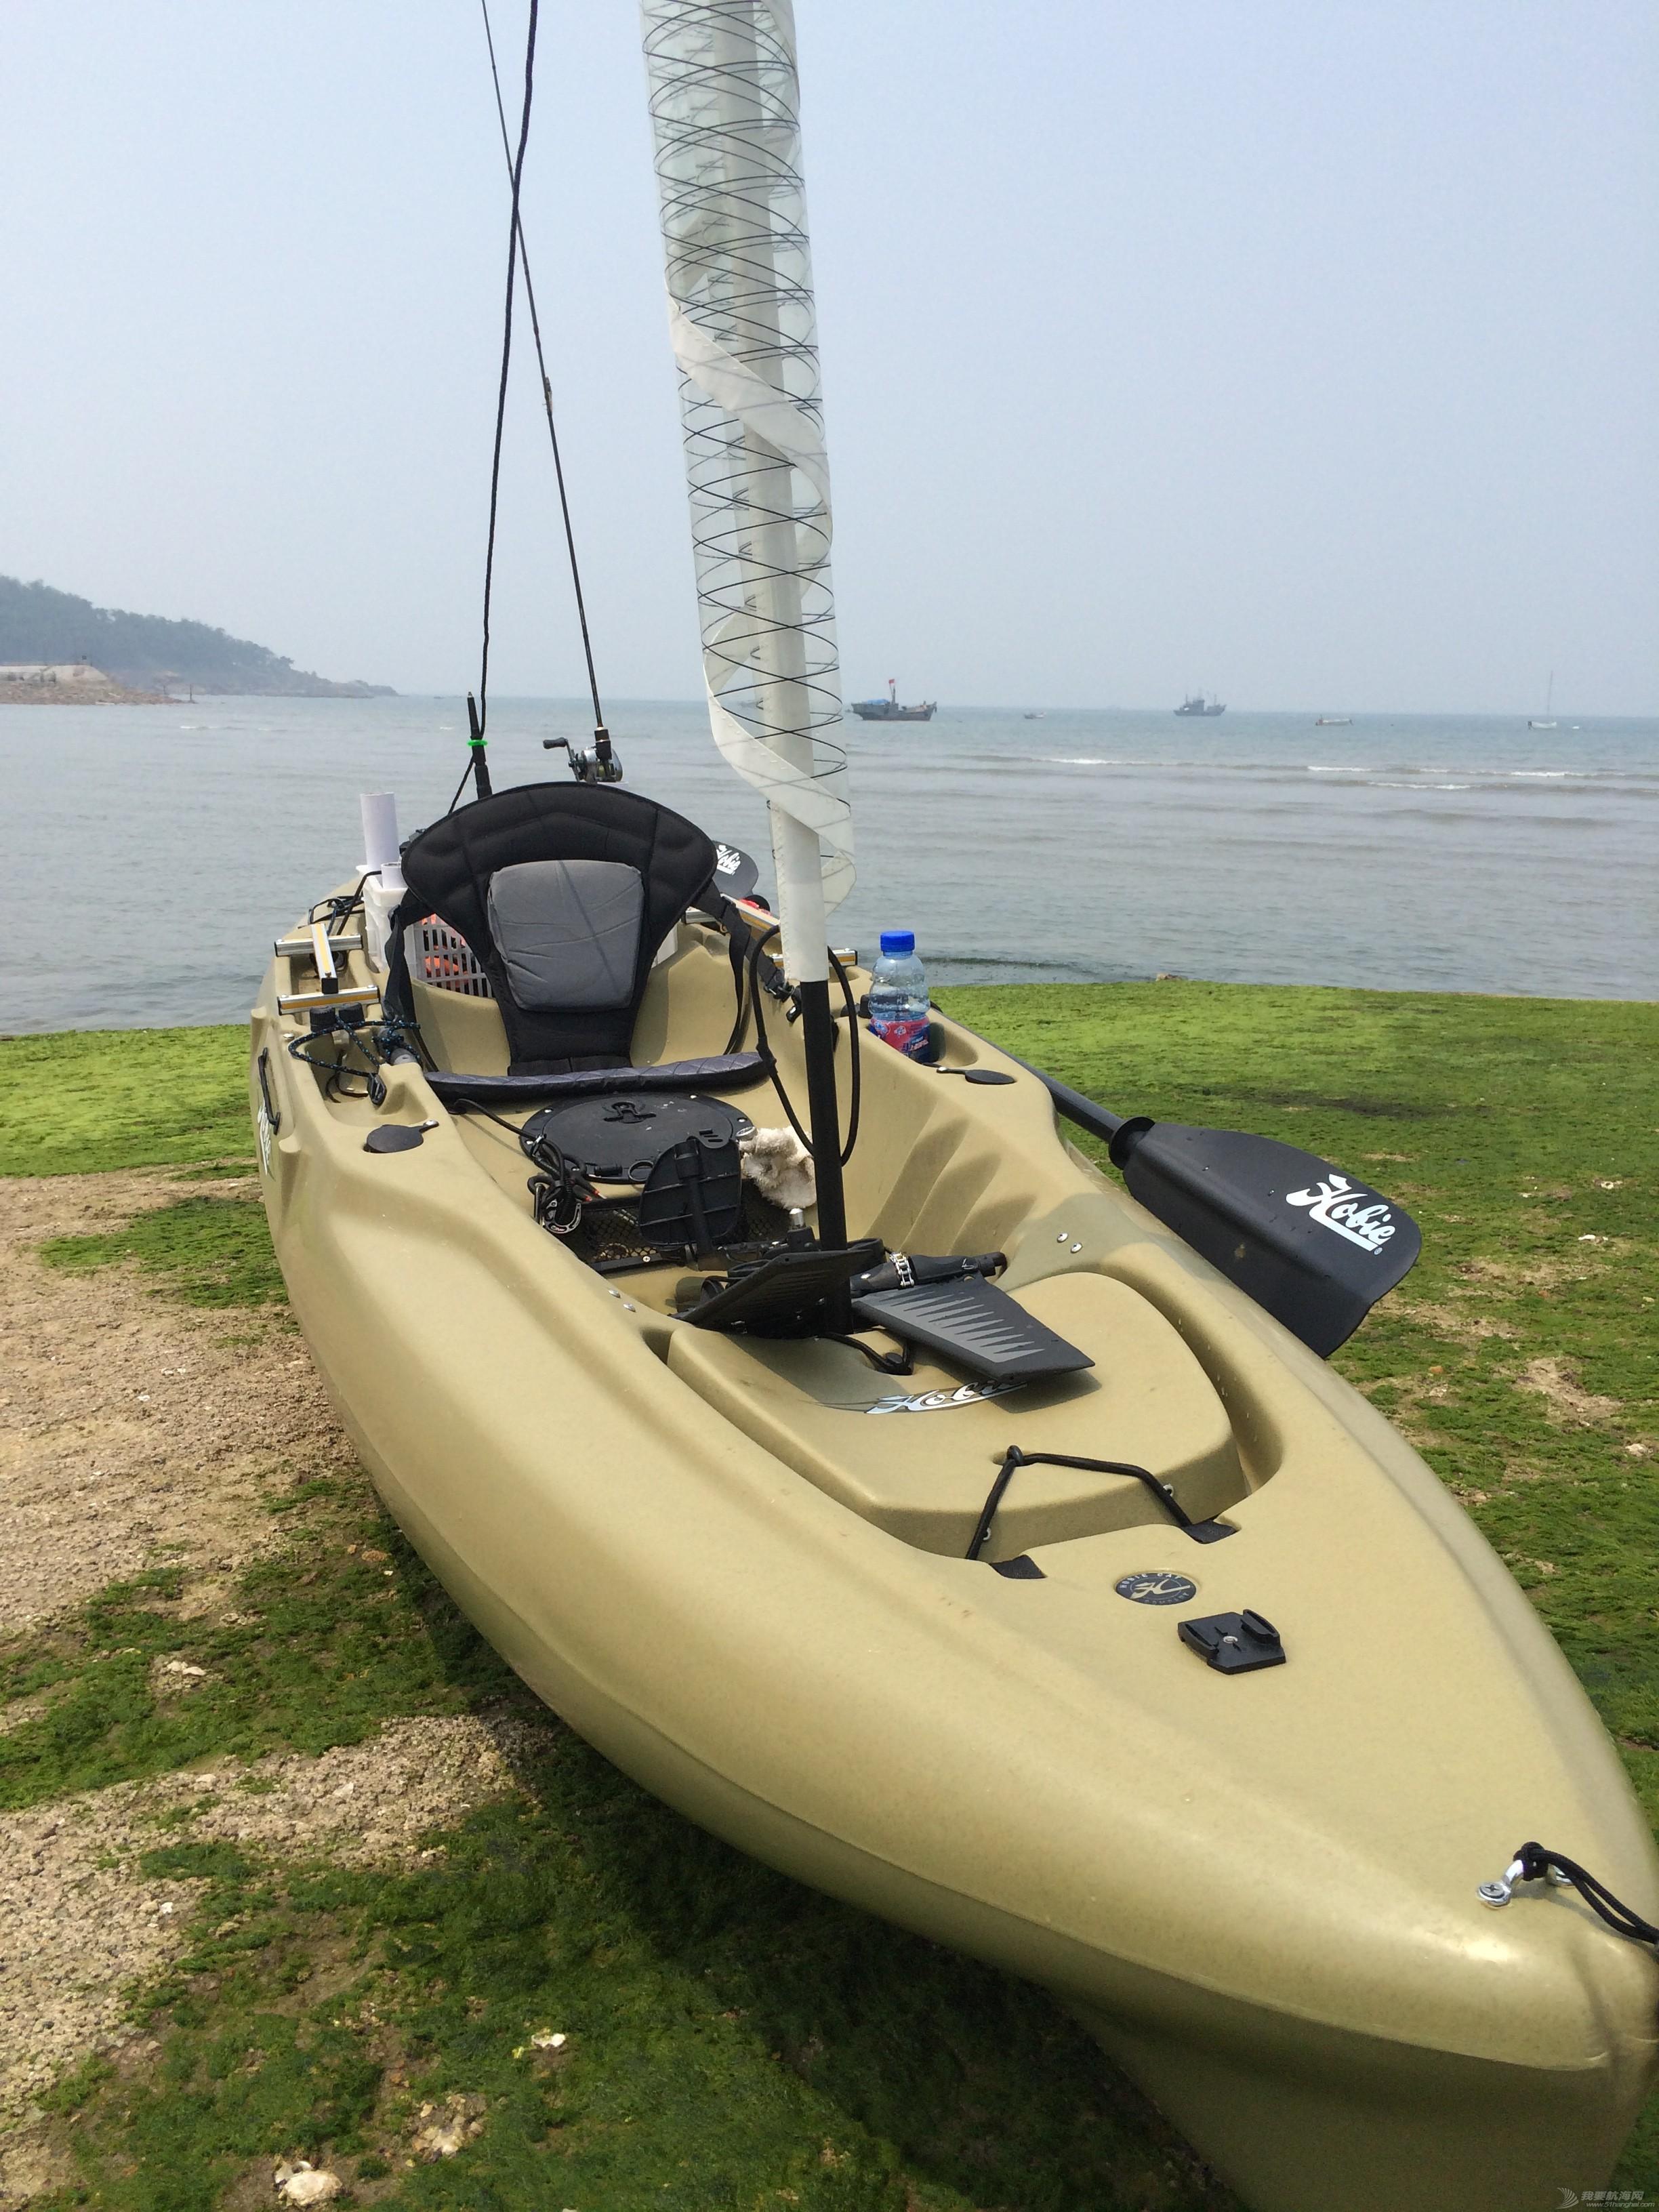 nbsp,原厂,系统,风帆,所以 hobie outback皮划艇 带风帆系统 青岛  002000ztqyeve7z0970cpk